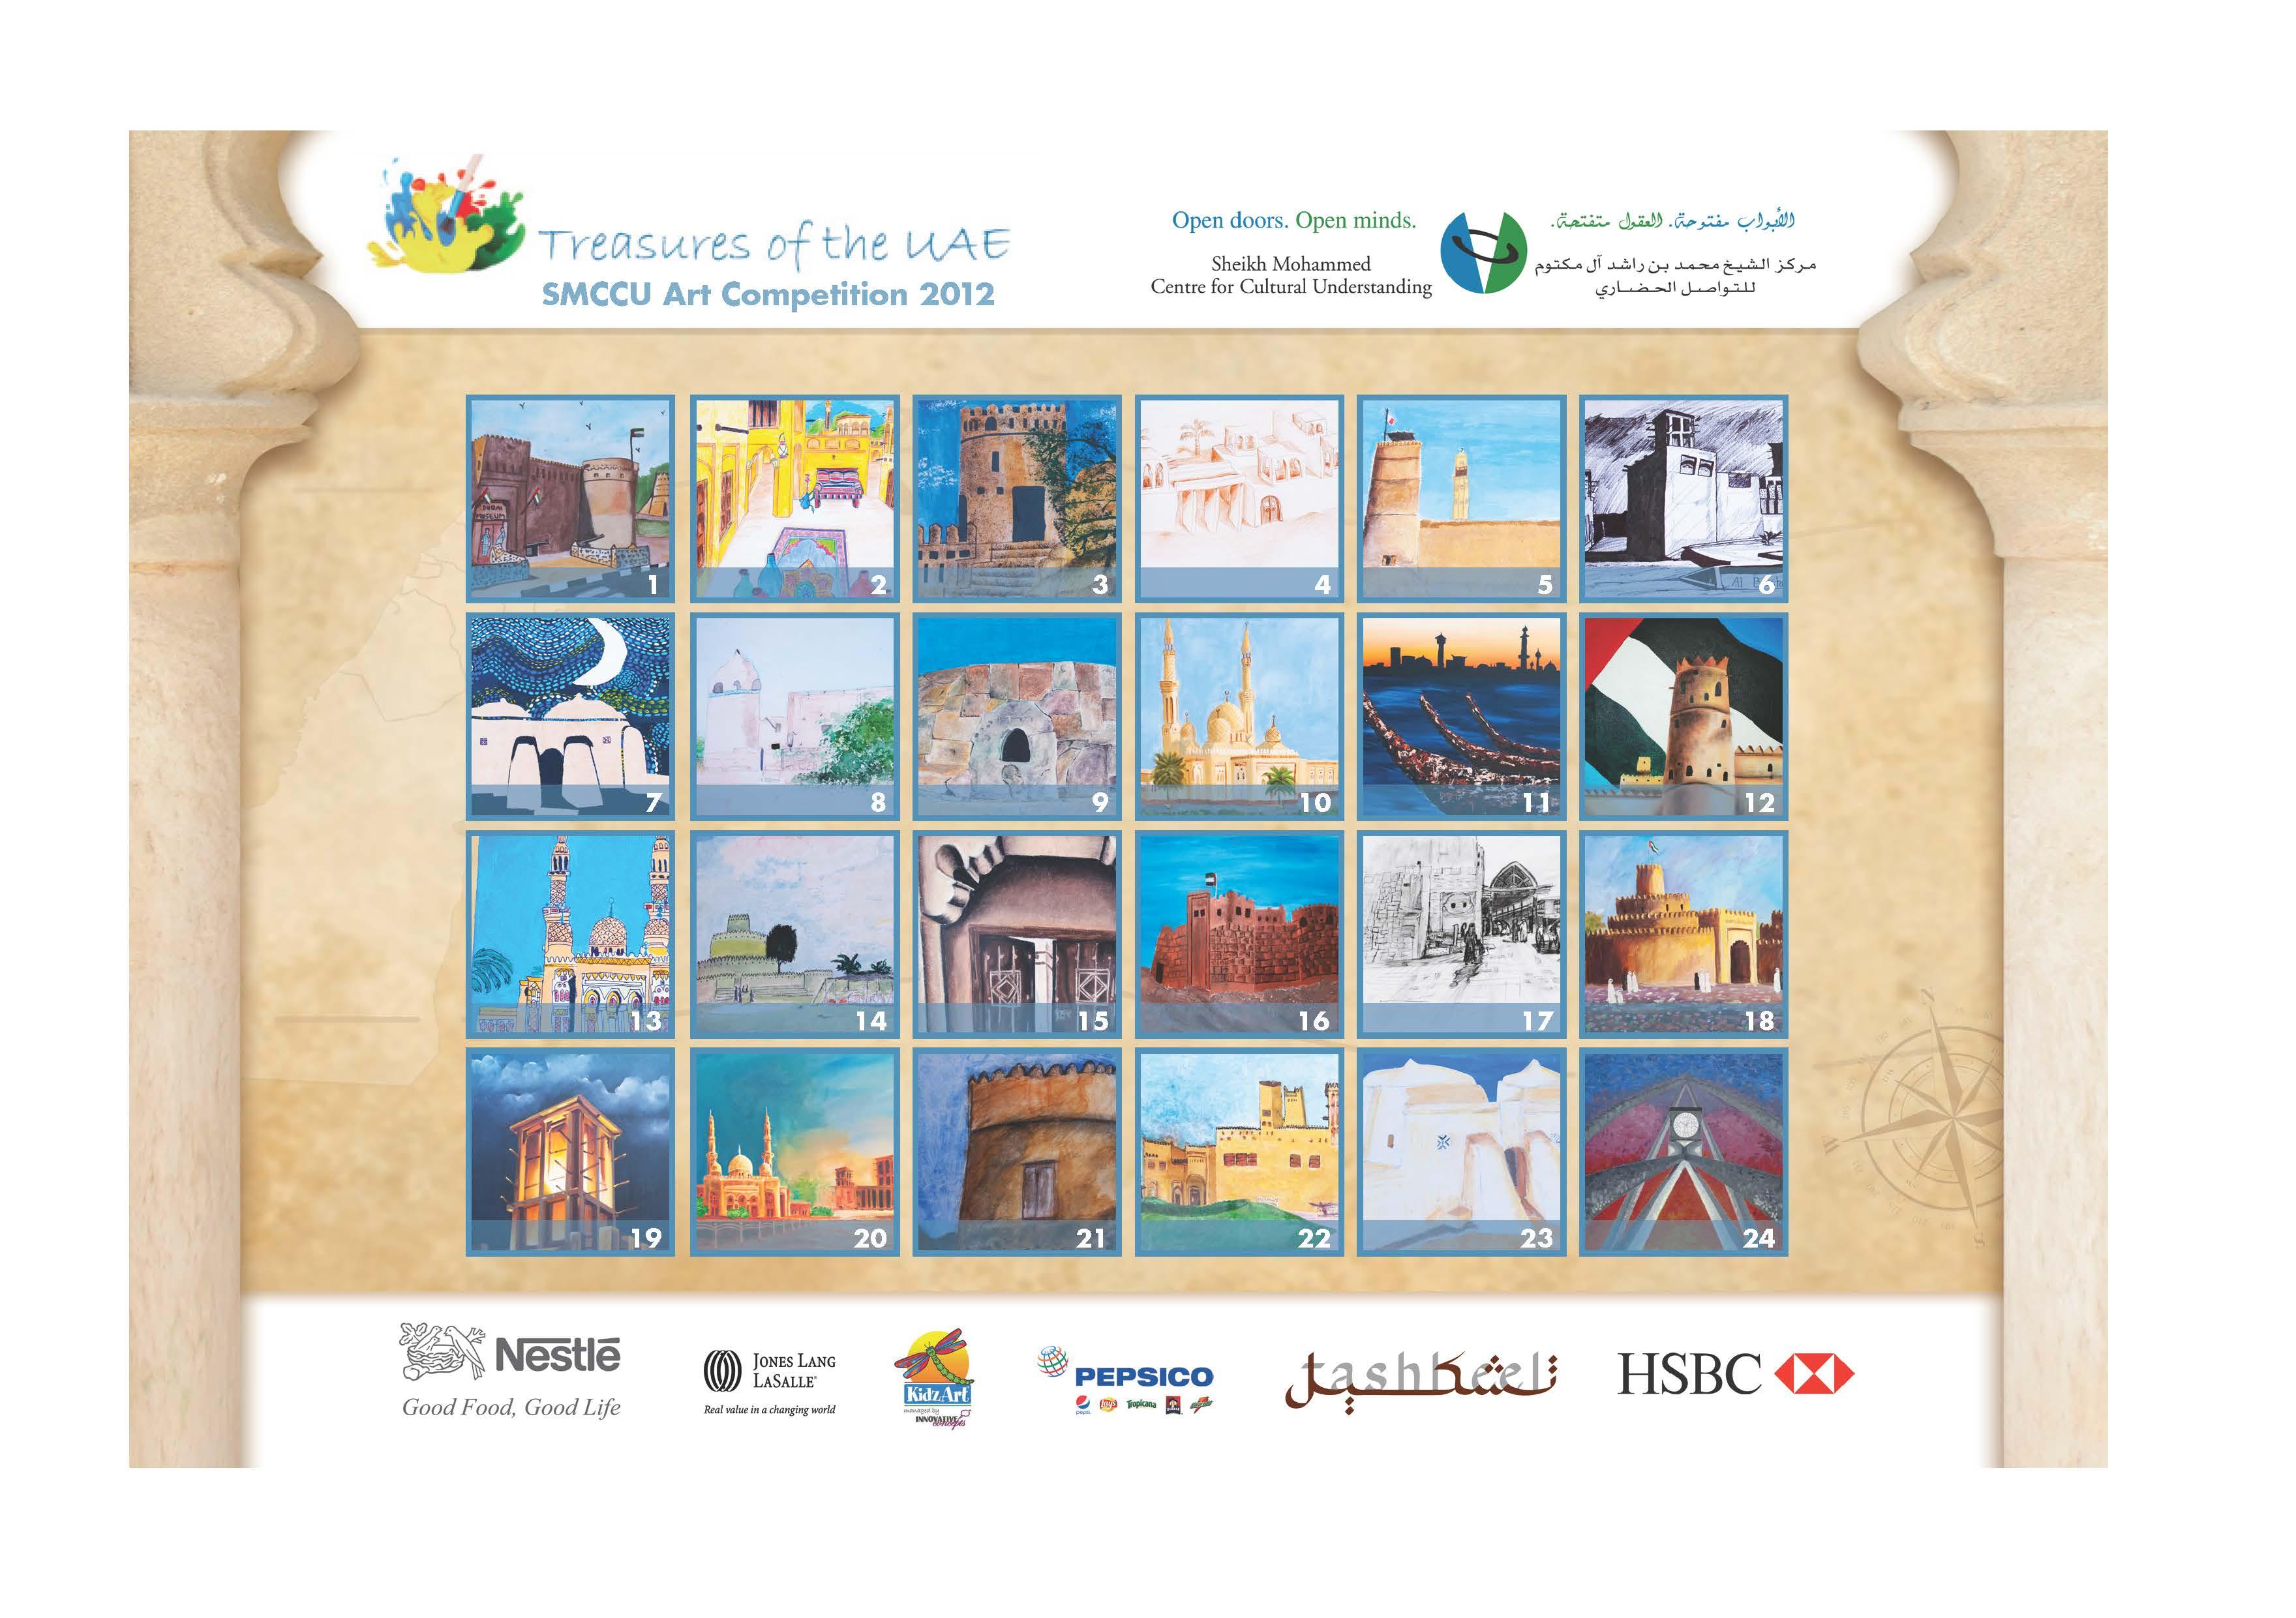 Weekly Calendar Uae : Treasures of the uae calendars sheikh mohammed